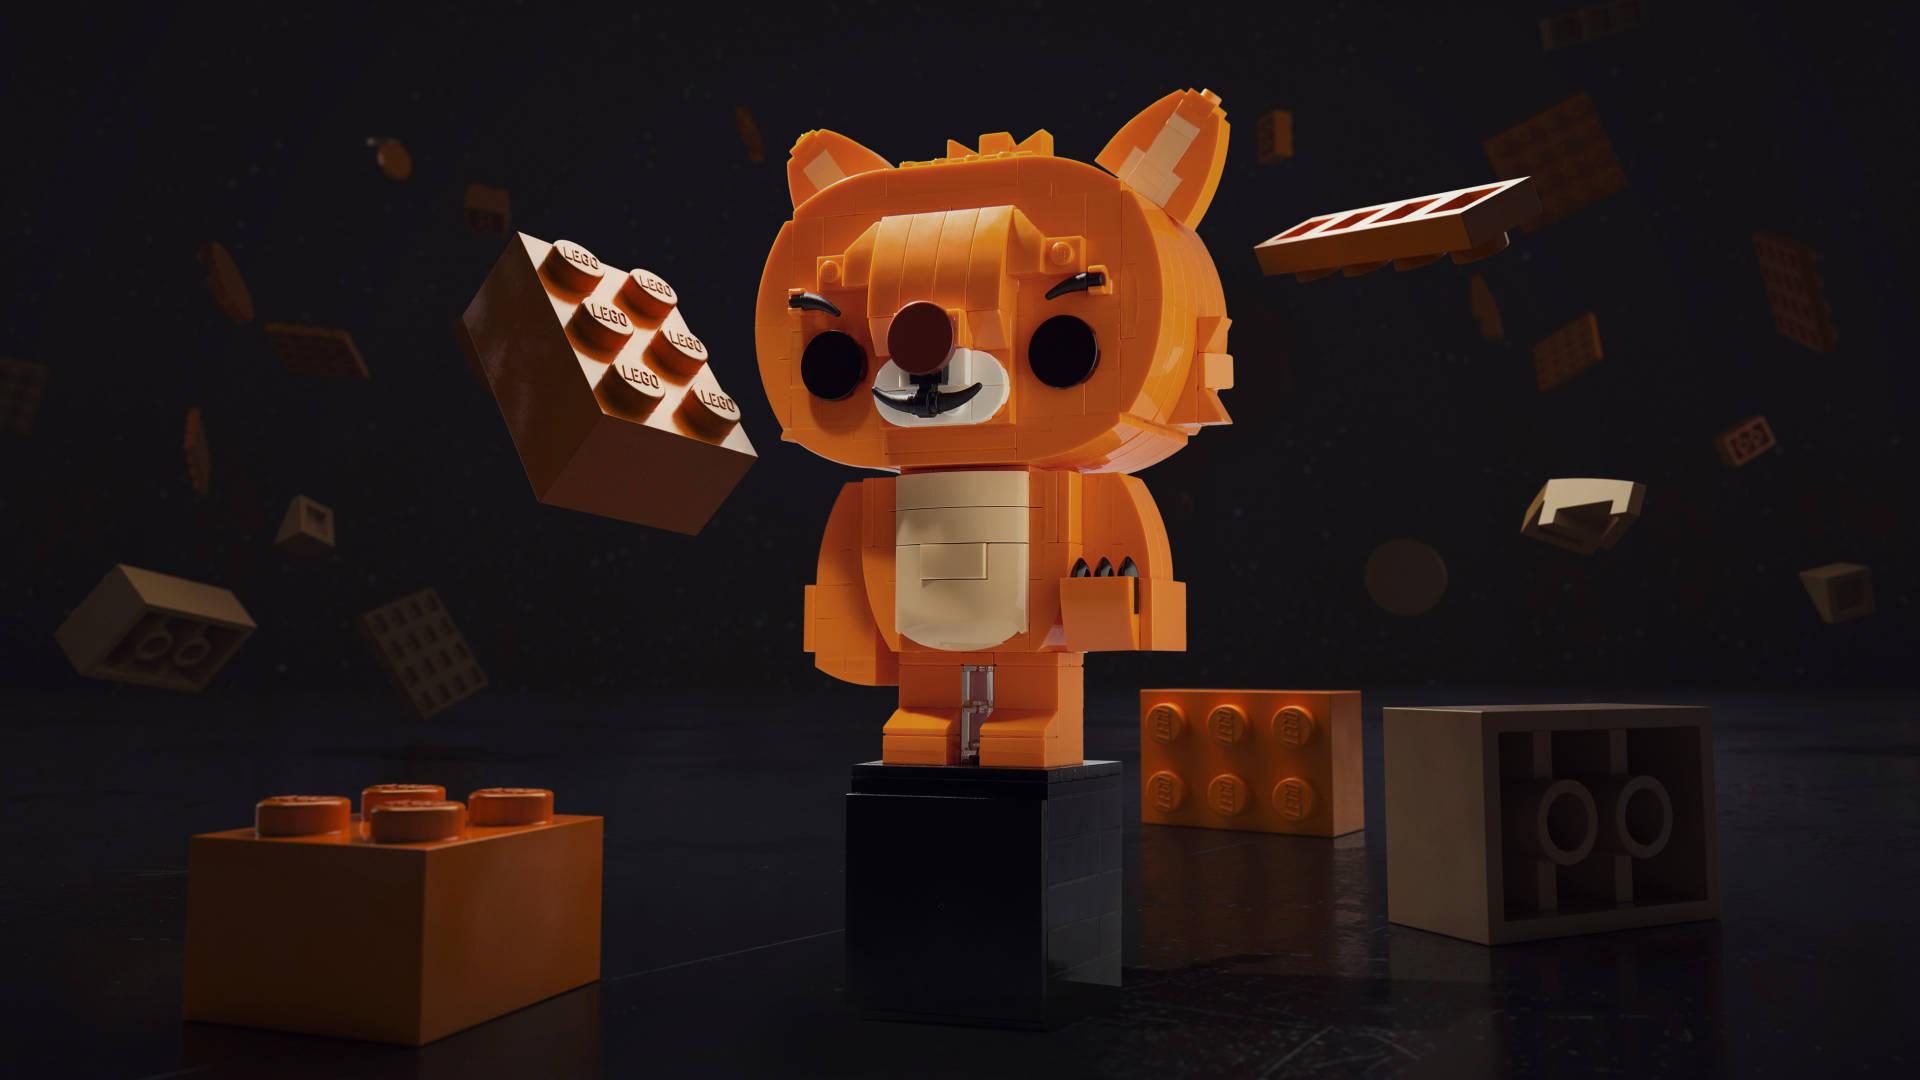 Ltd Edition Lego Future Lion[1]